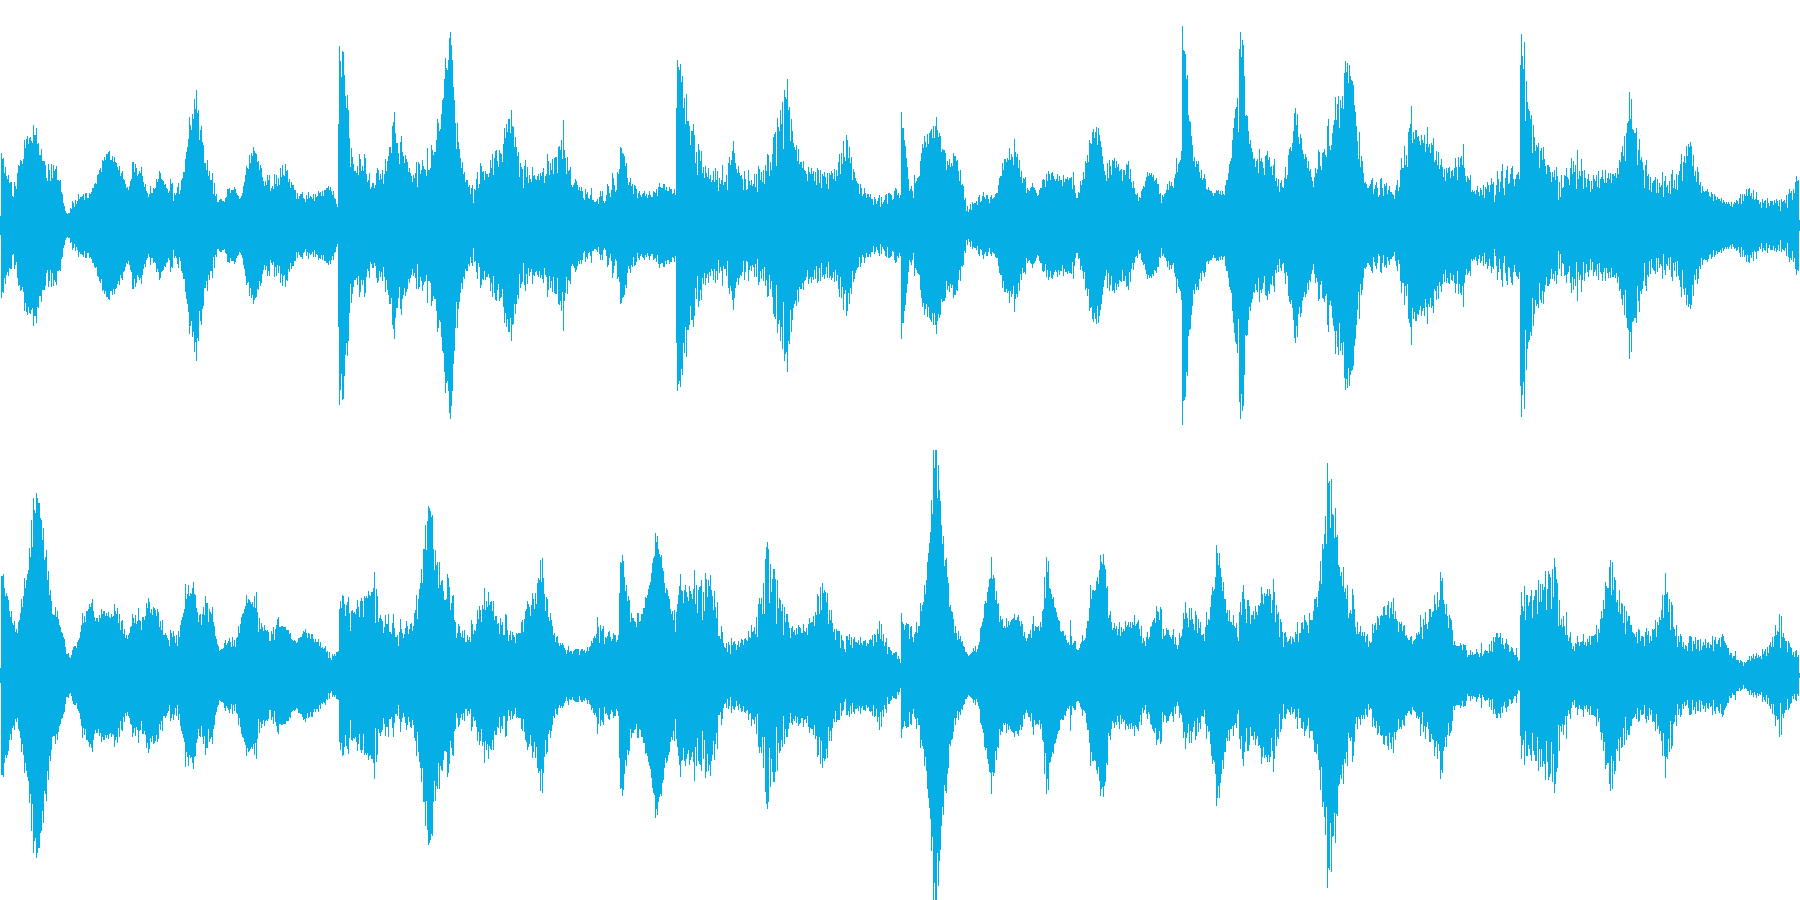 k011 アラーム音(ループ仕様)の再生済みの波形